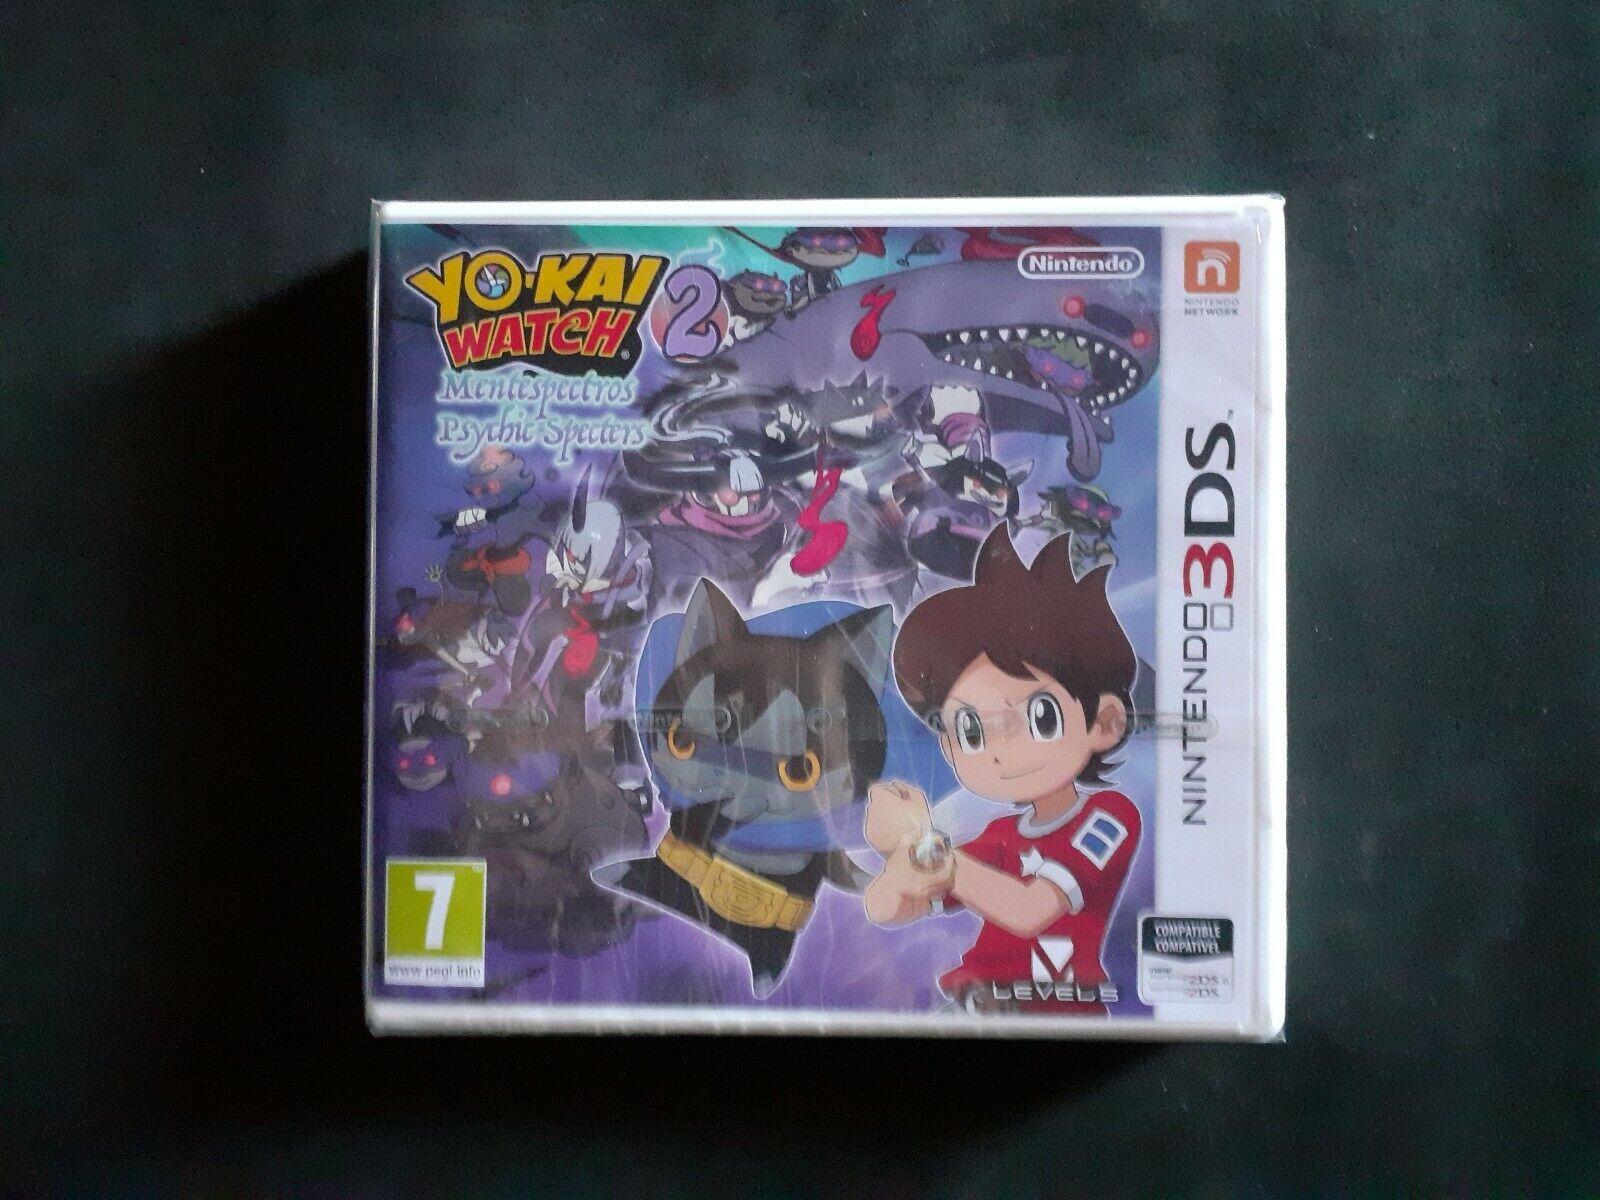 YO-KAI YOKAI YO KAI WATCH 2 MENTESPECTROS - 3DS - PAL ESPAÑA...